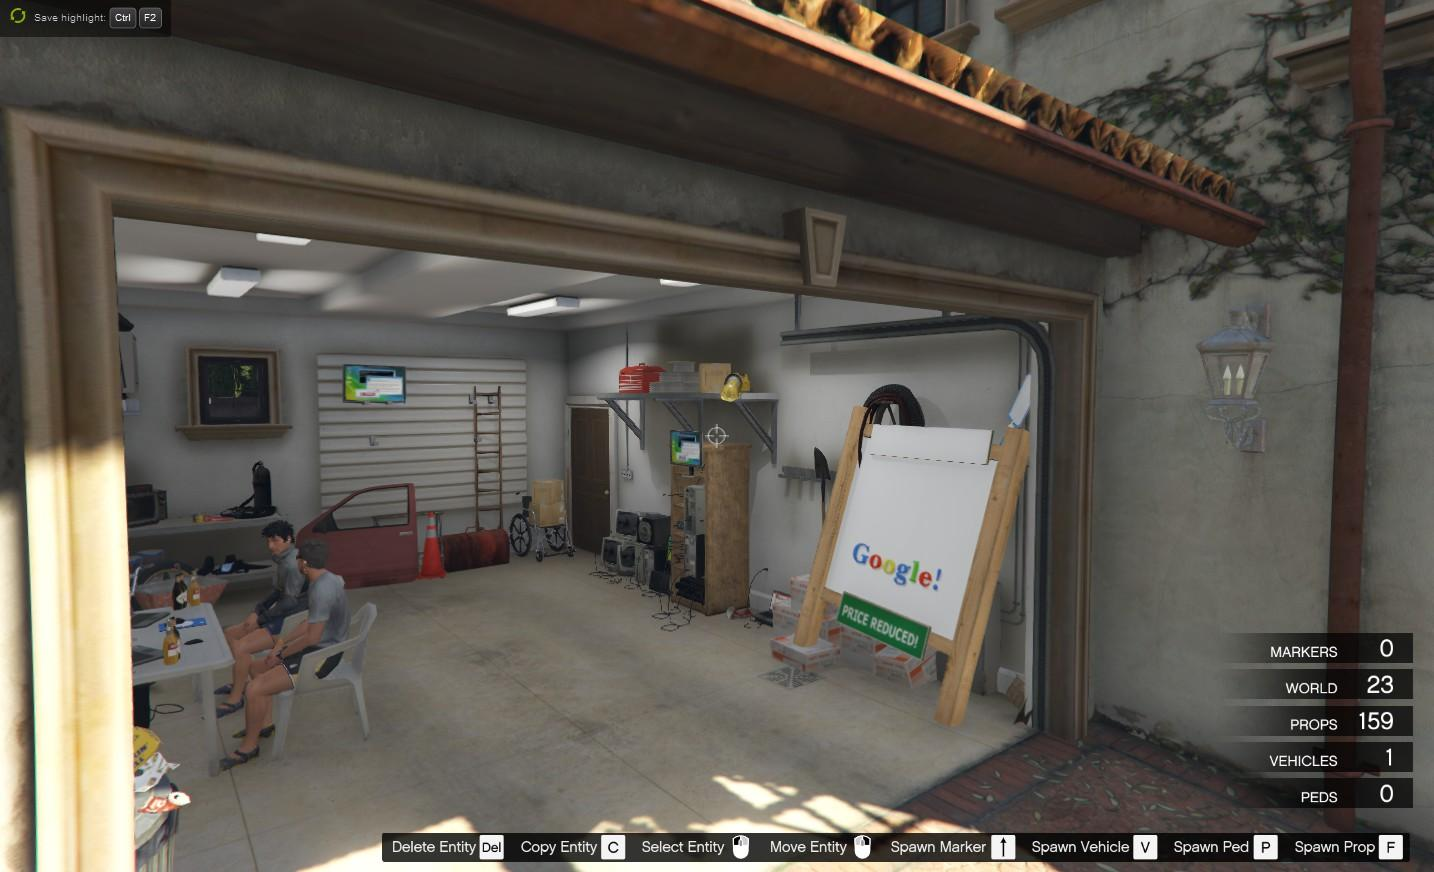 Original startup google garage 1998 michael gta5 for A 1 garage